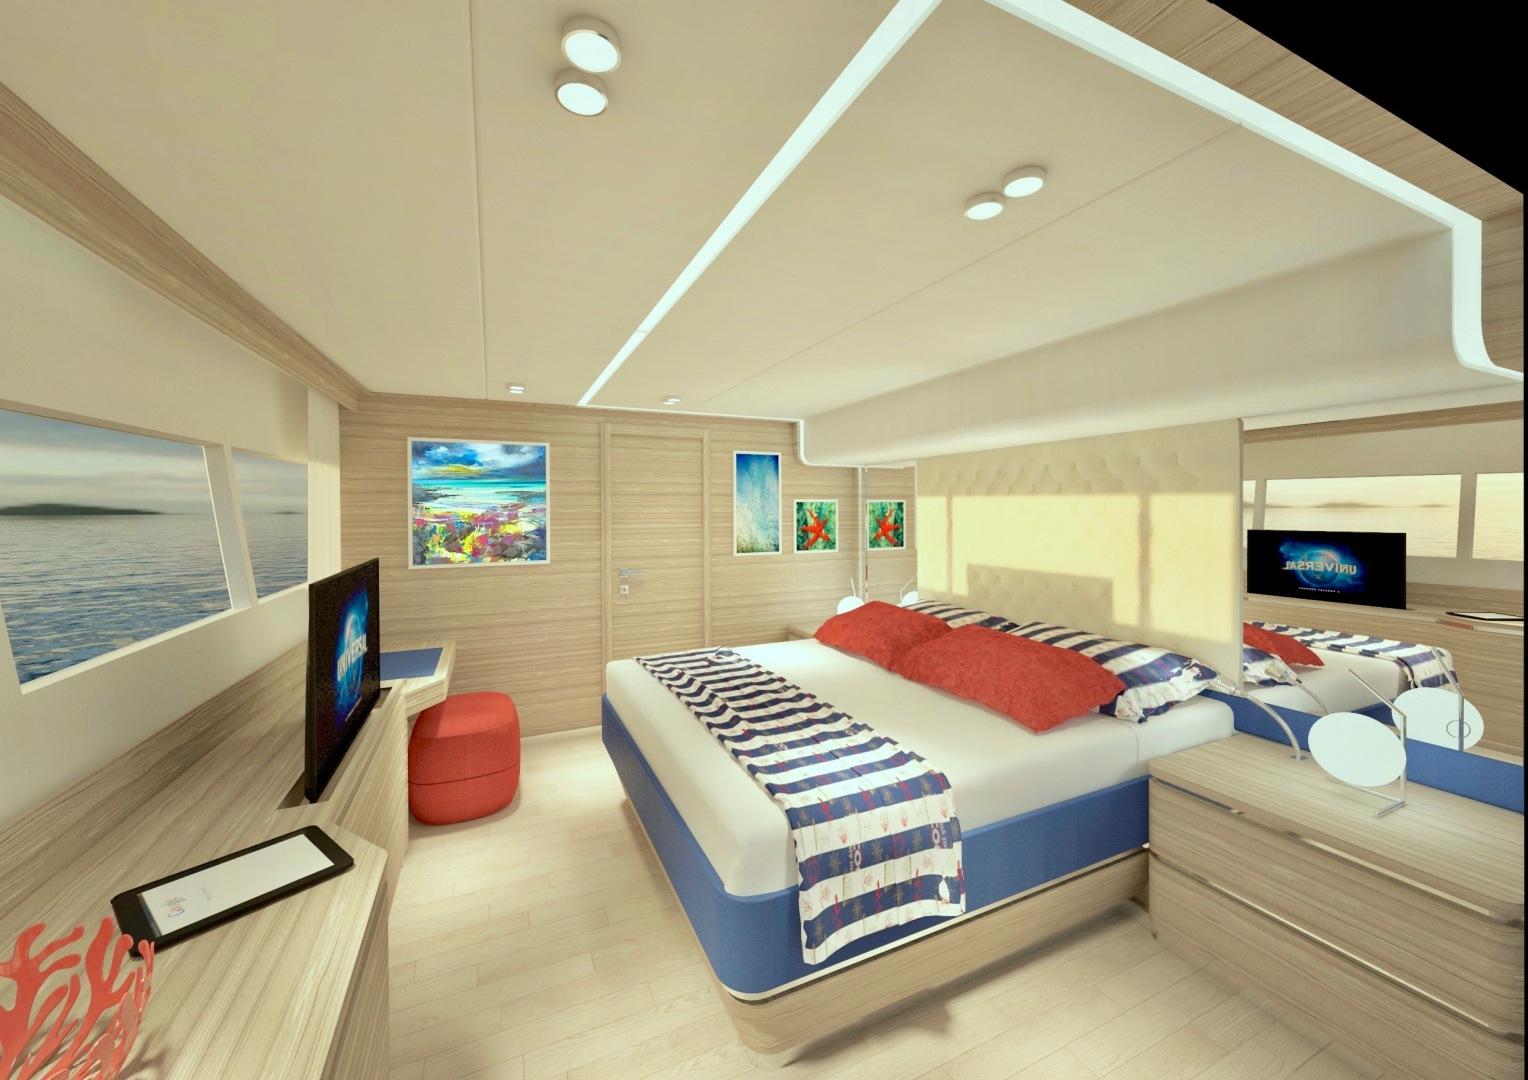 Silent-Yachts-Silent 80  2020-SILENT 80 Ancona-Italy-VIP stateroom-1262450 | Thumbnail